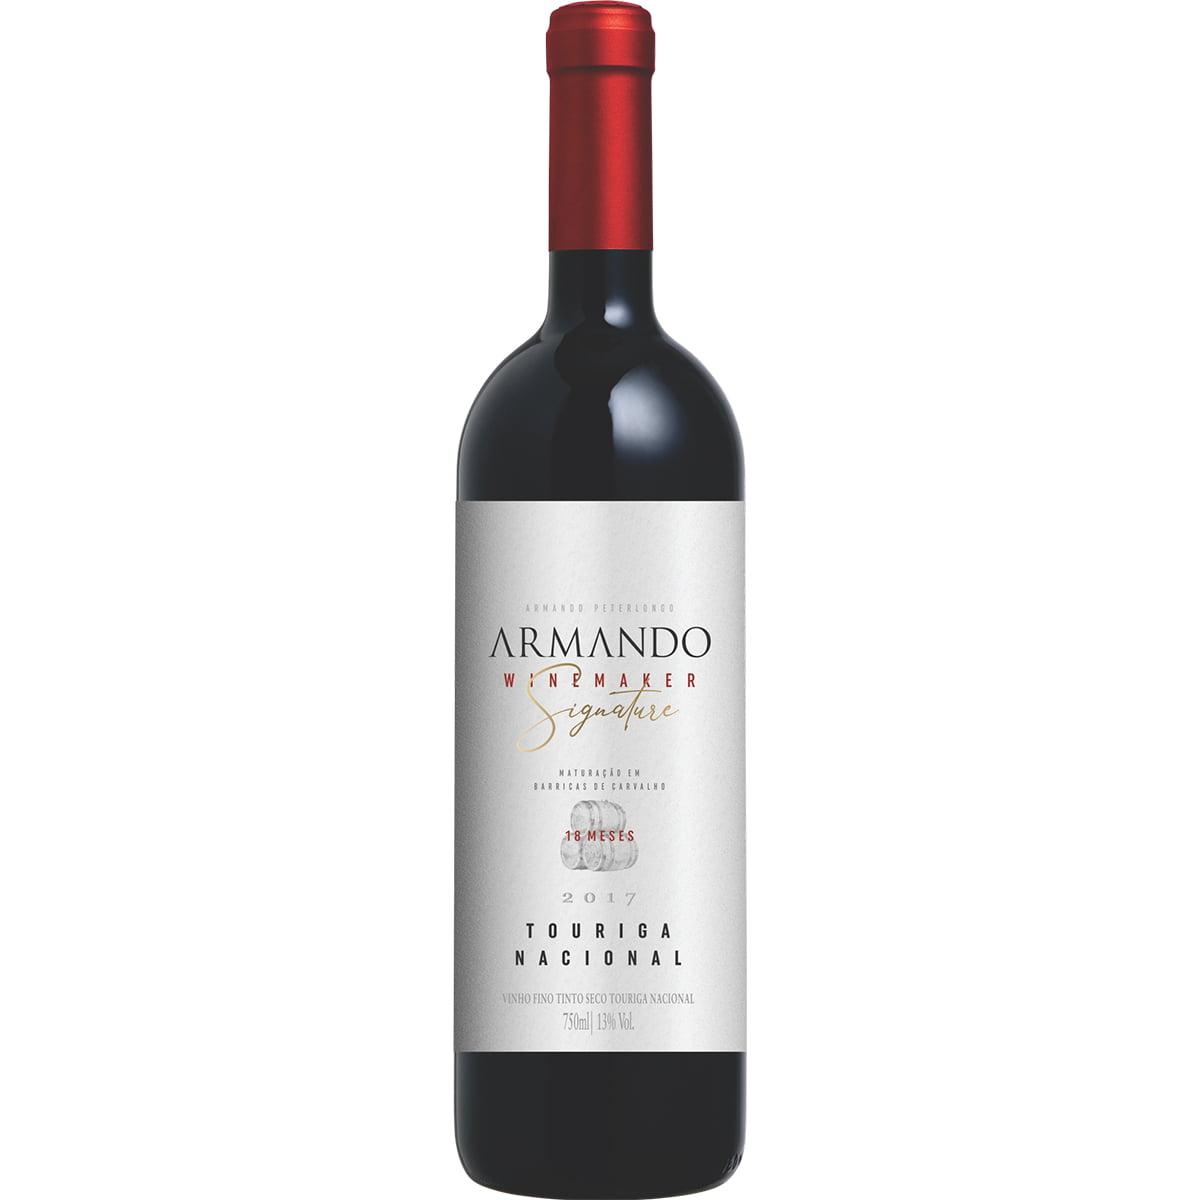 Vinho Peterlongo Armando Winemaker Signature Touriga Nacional Tinto 750ml